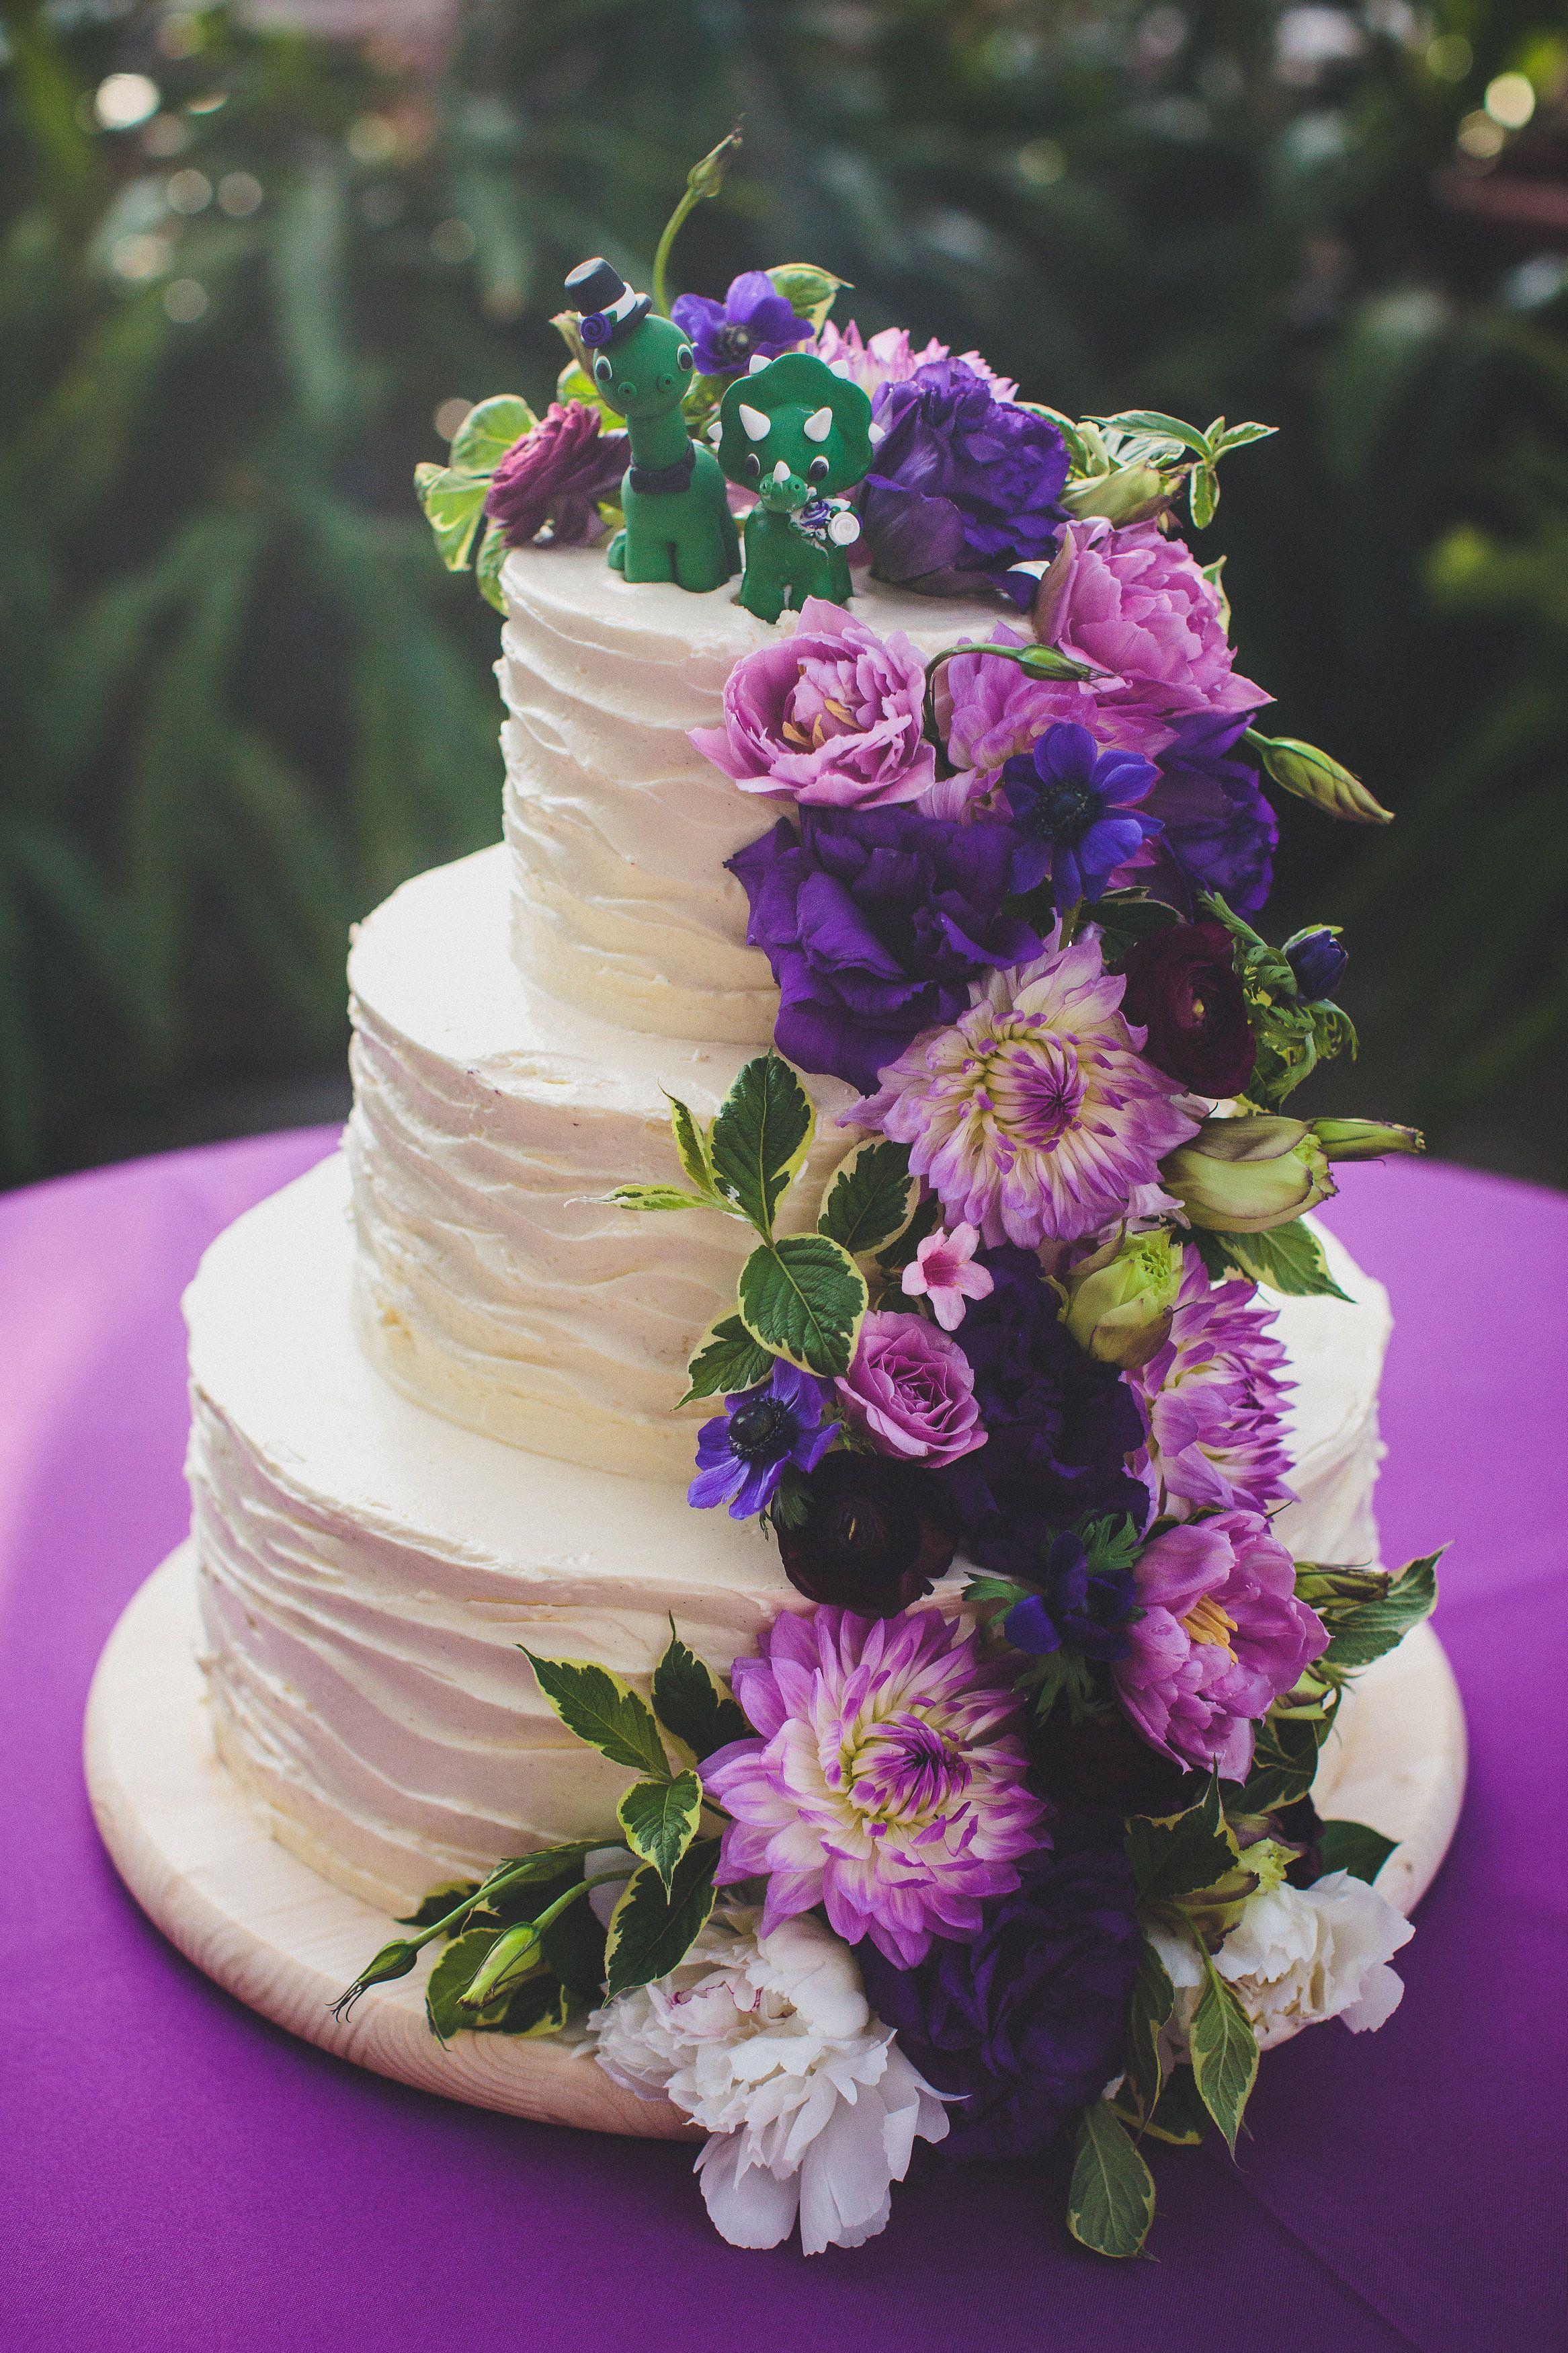 Jazzyflowers Jazzy Flowers Garfield Park Conservatory Chicago Wedding Cake Purple